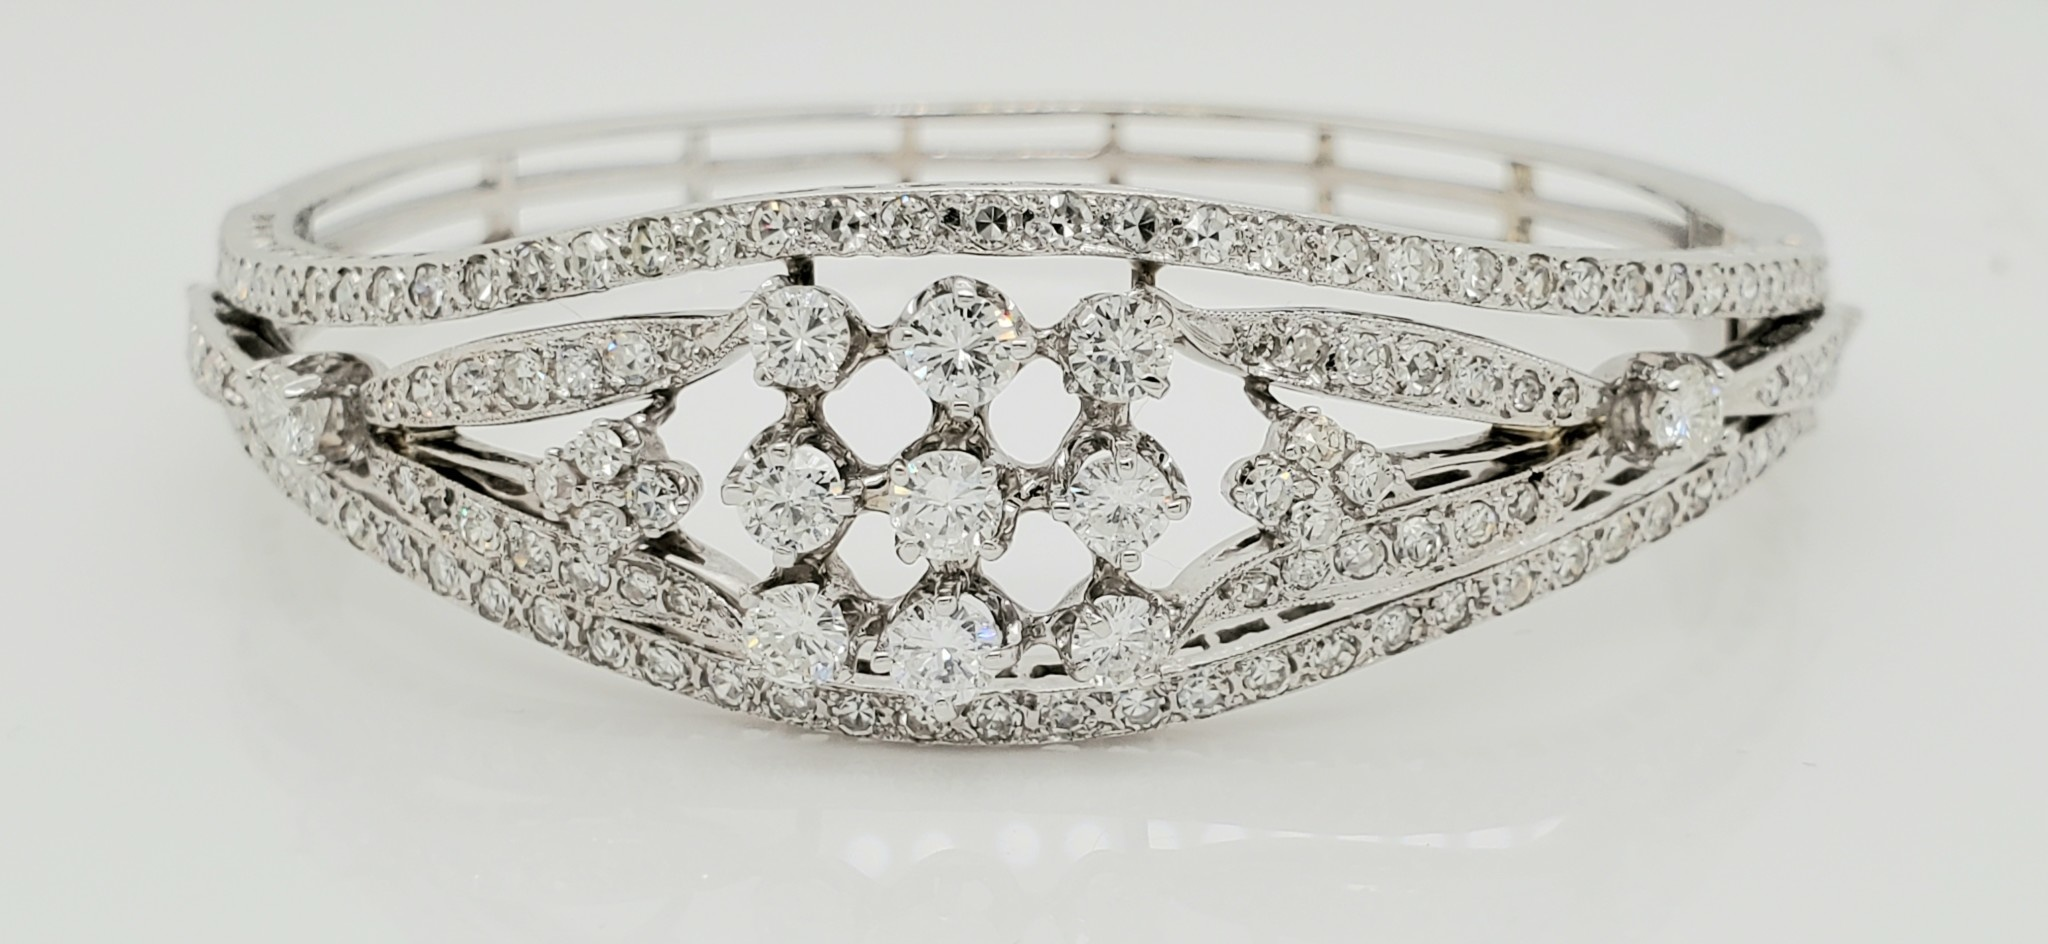 14KT White Gold Vintage Diamond Bangle 3.60 CTTW